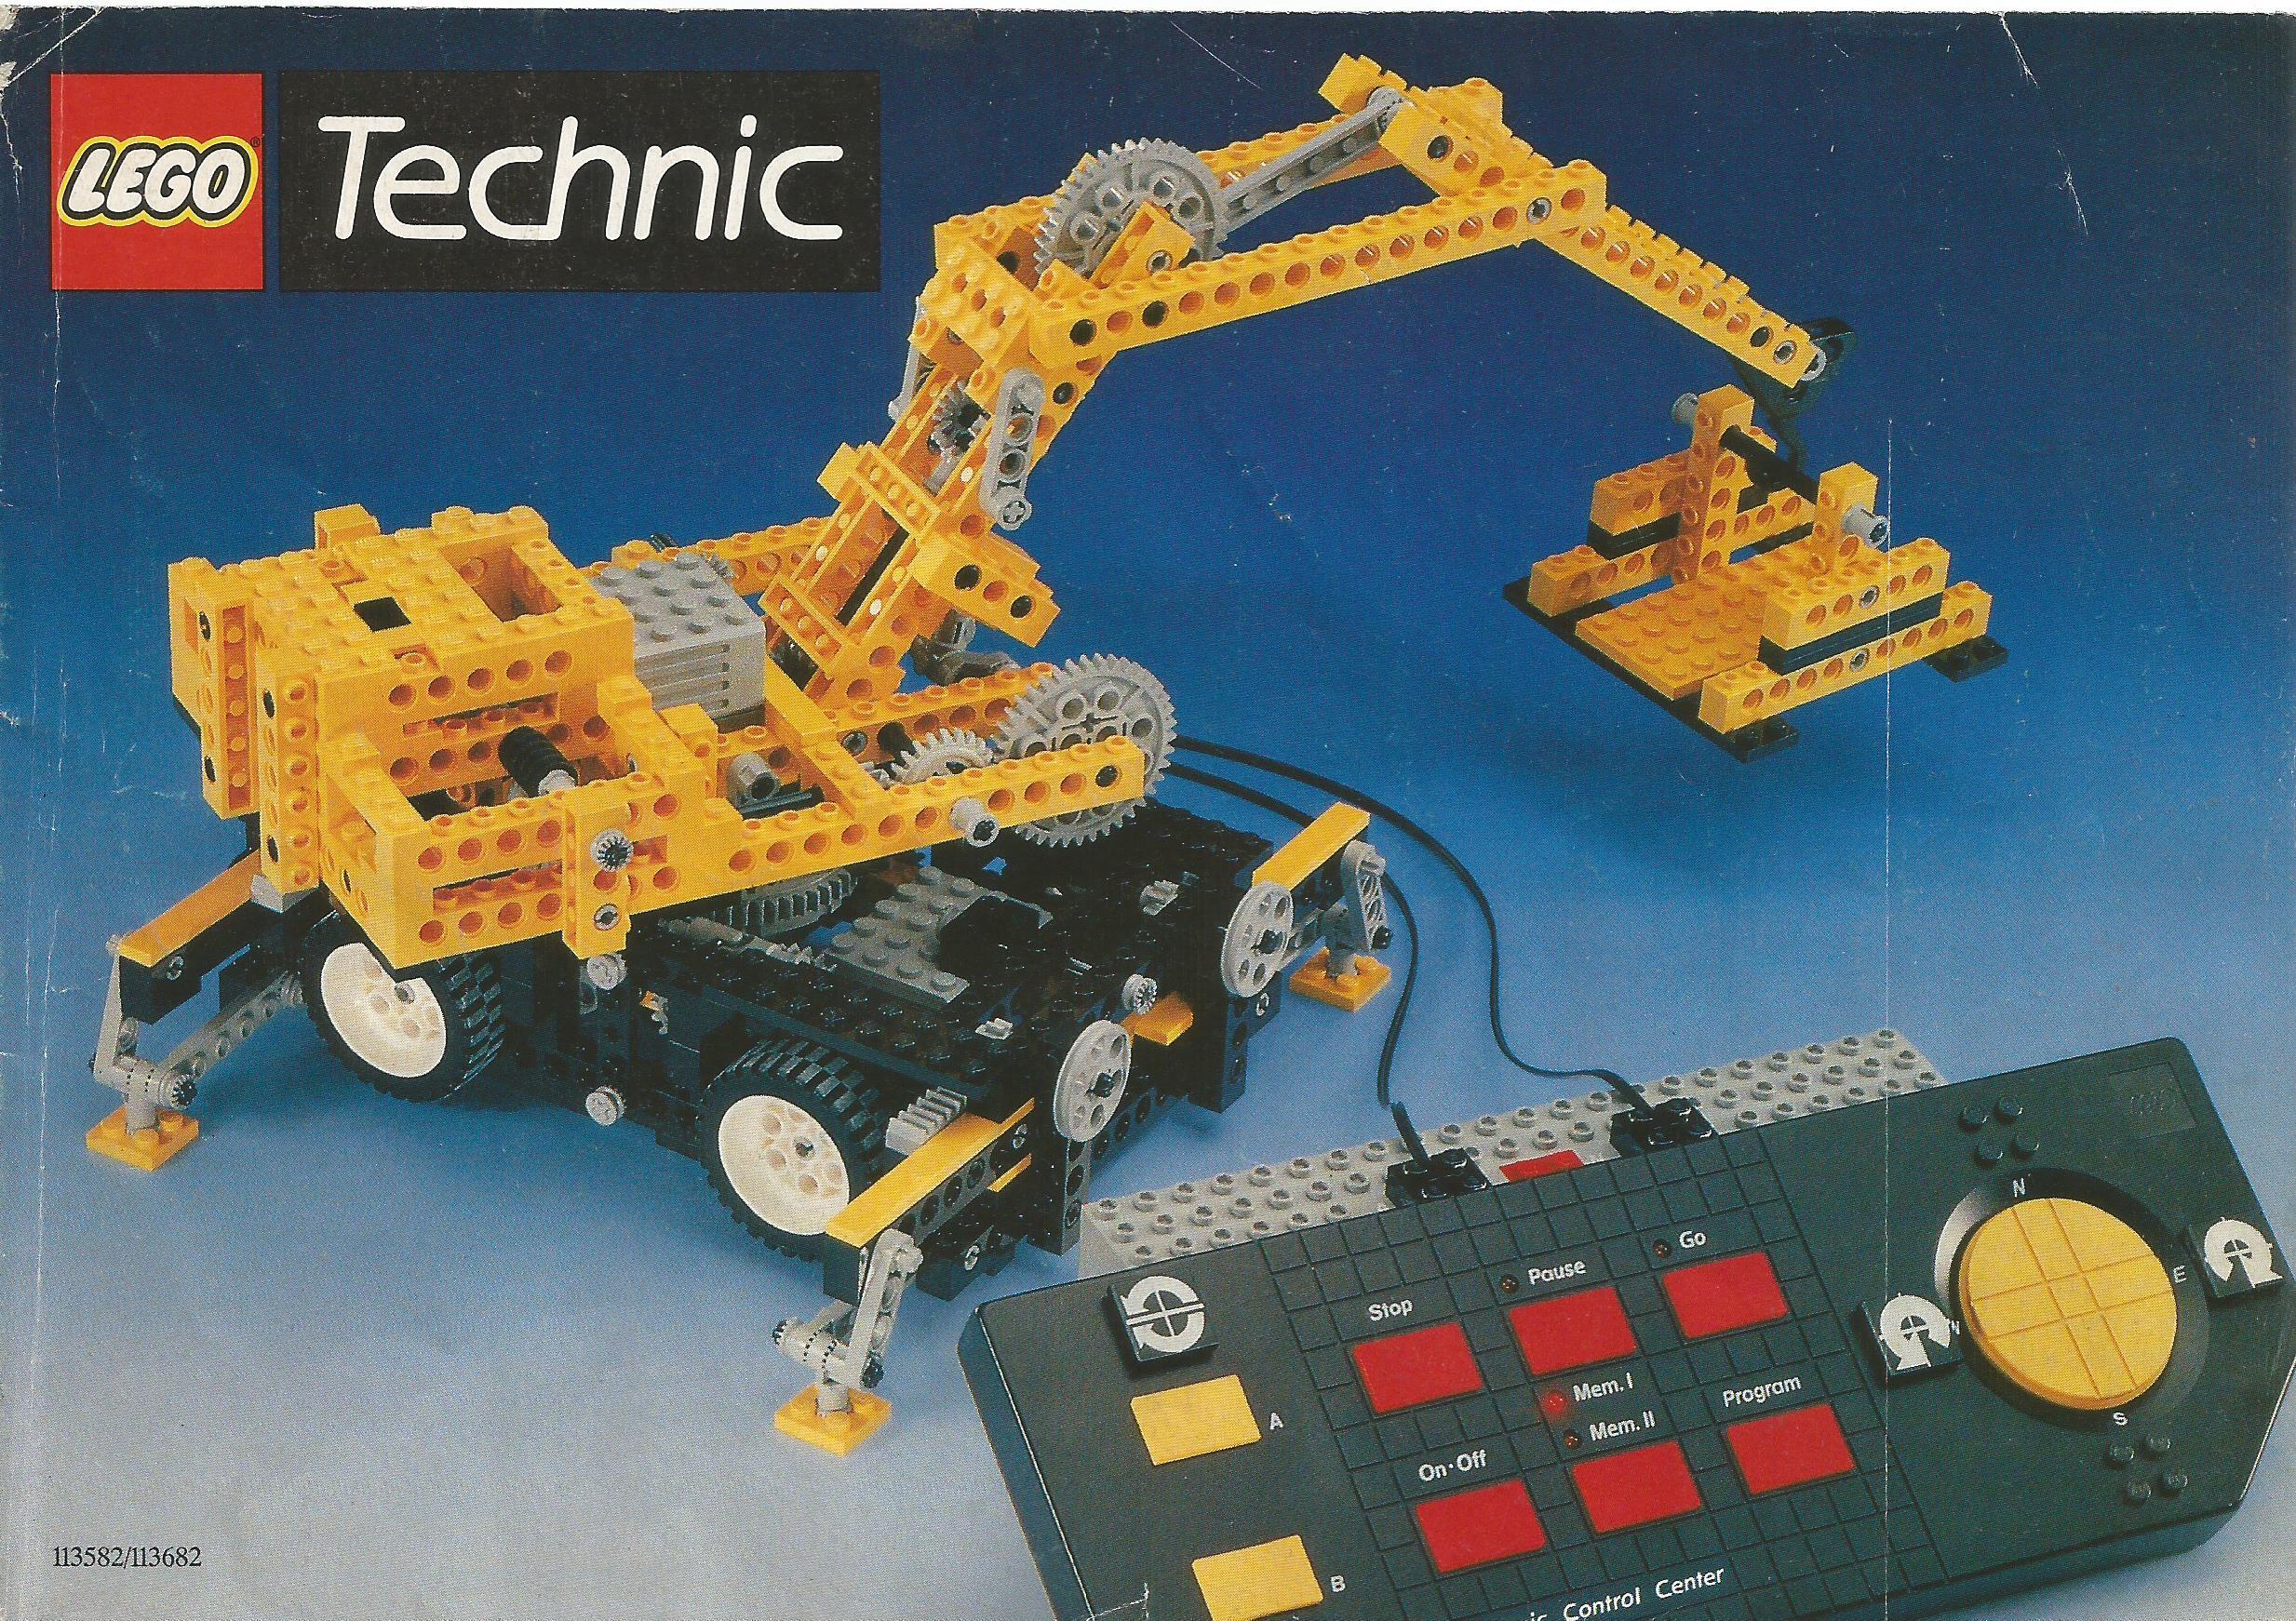 1990-es európai Lego Technic katalógus